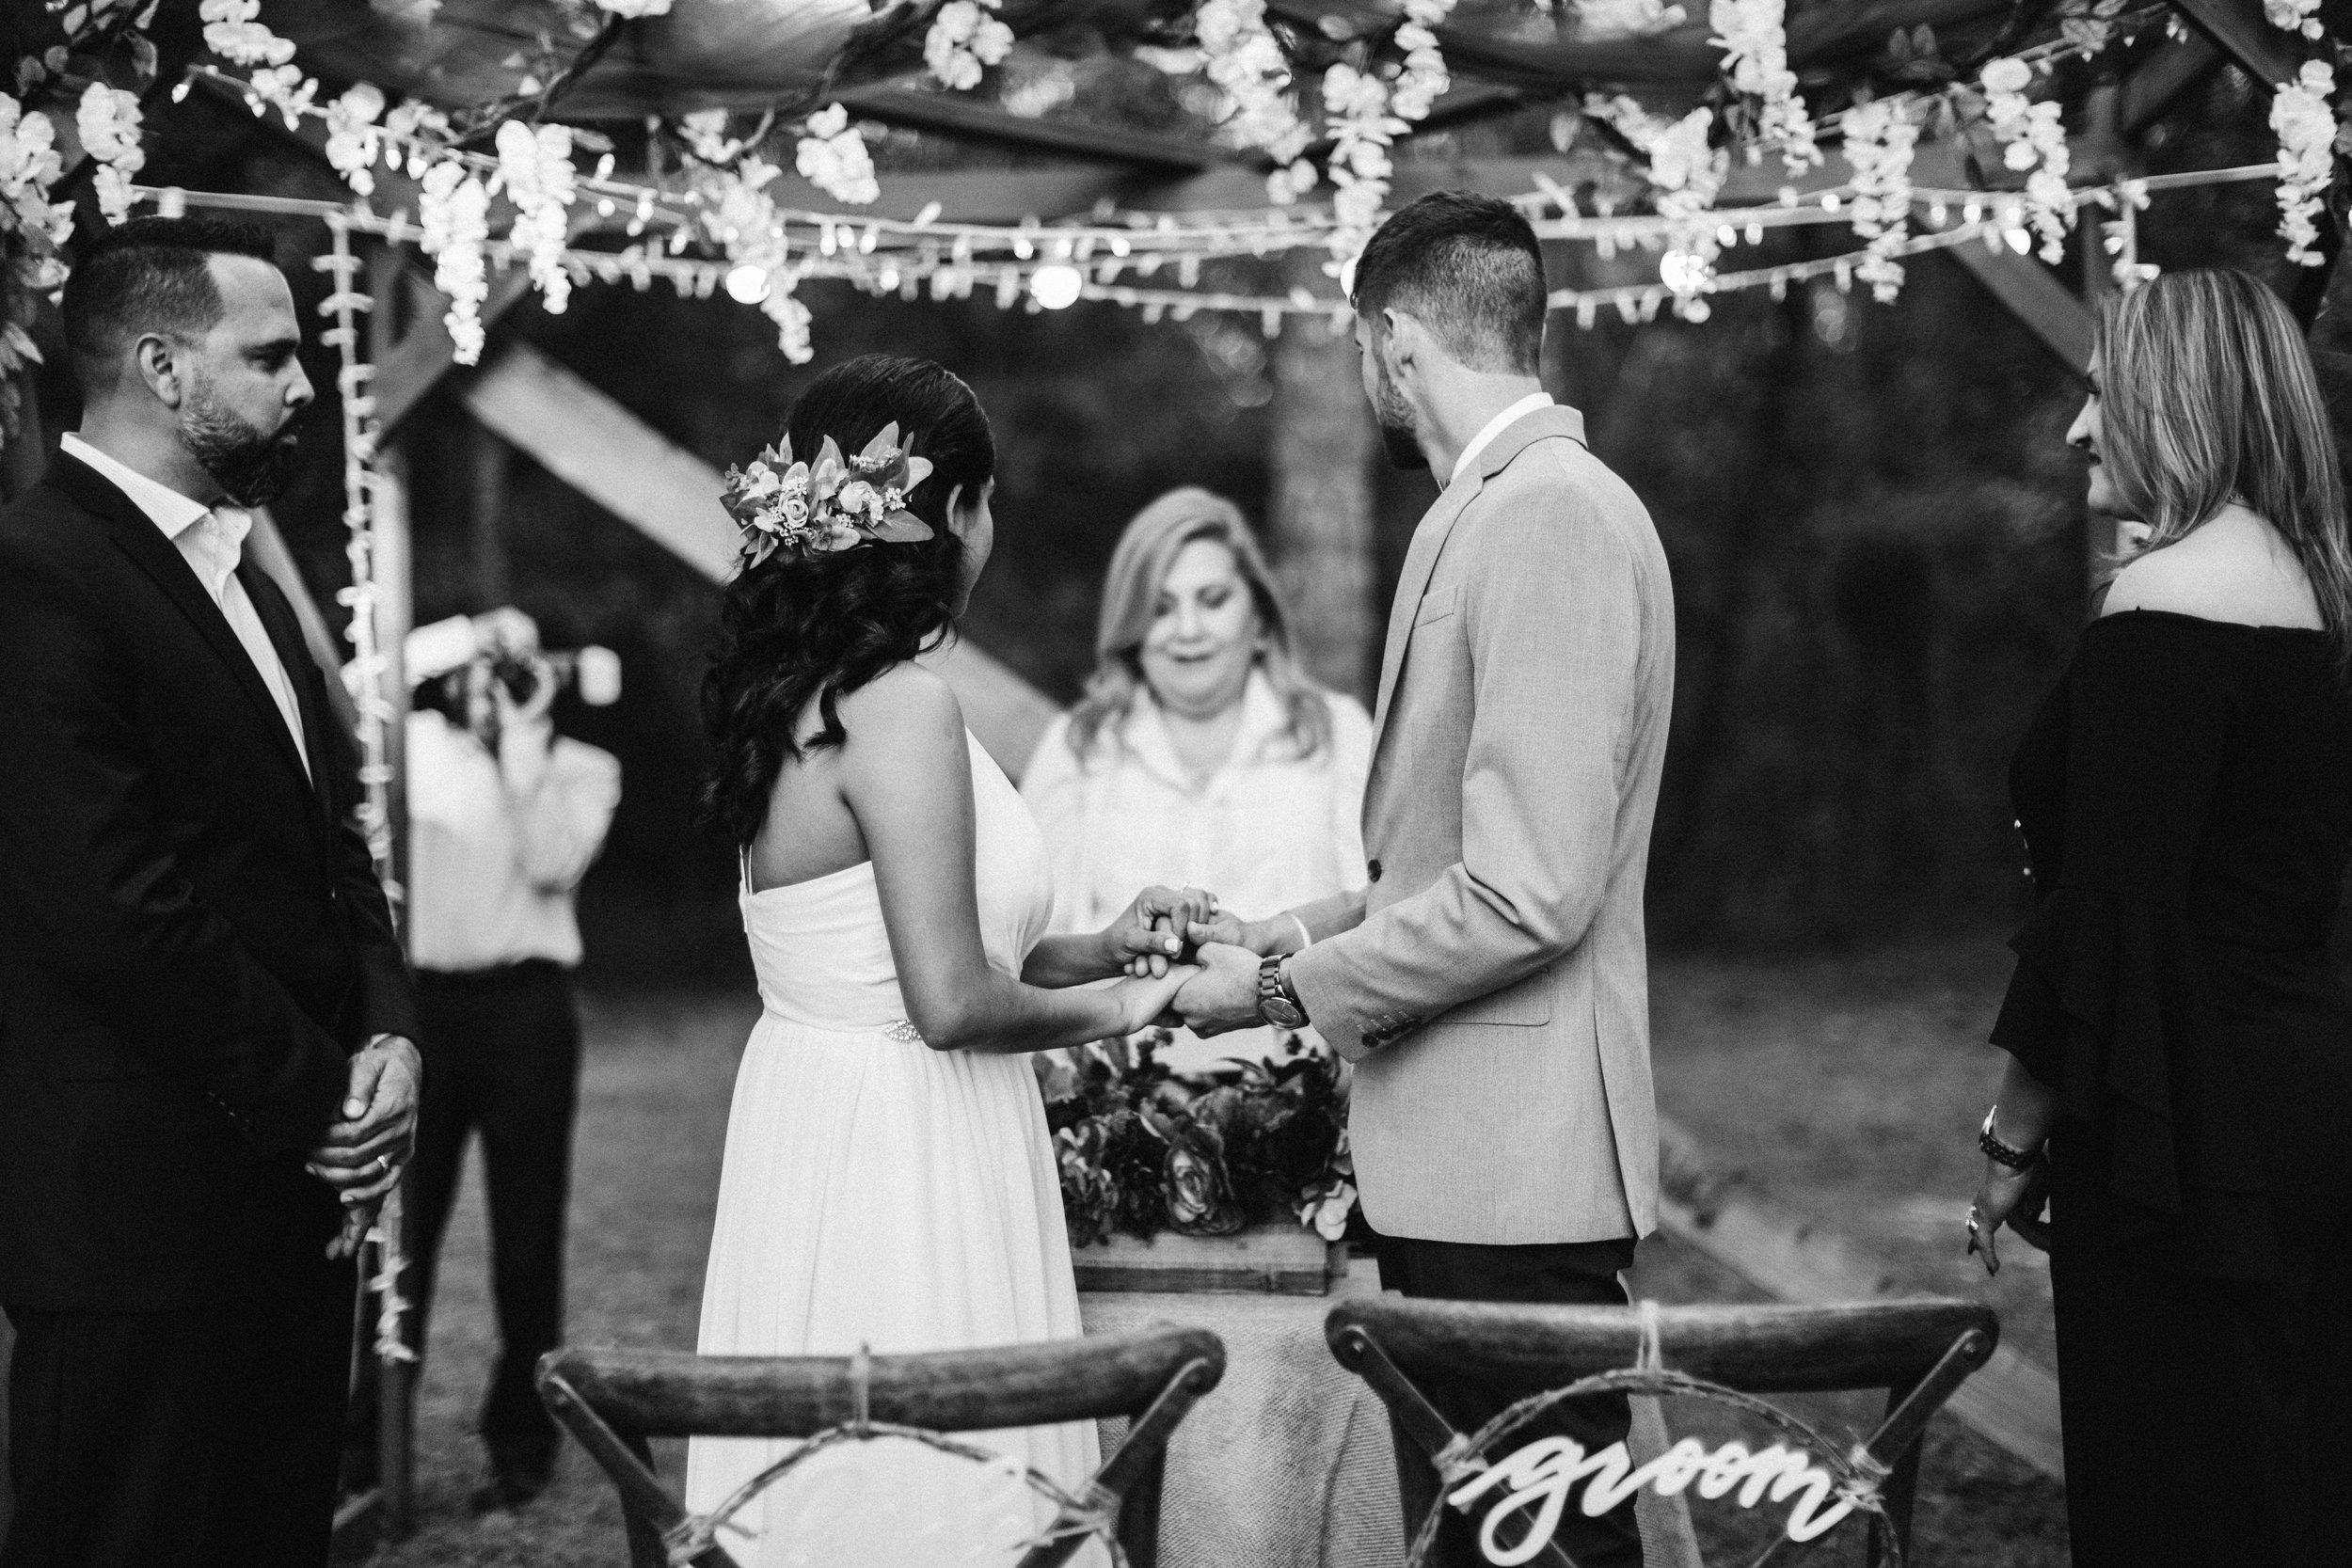 2018.11.03 Jael and Edel Ocala Wedding FINALS (244 of 441).jpg